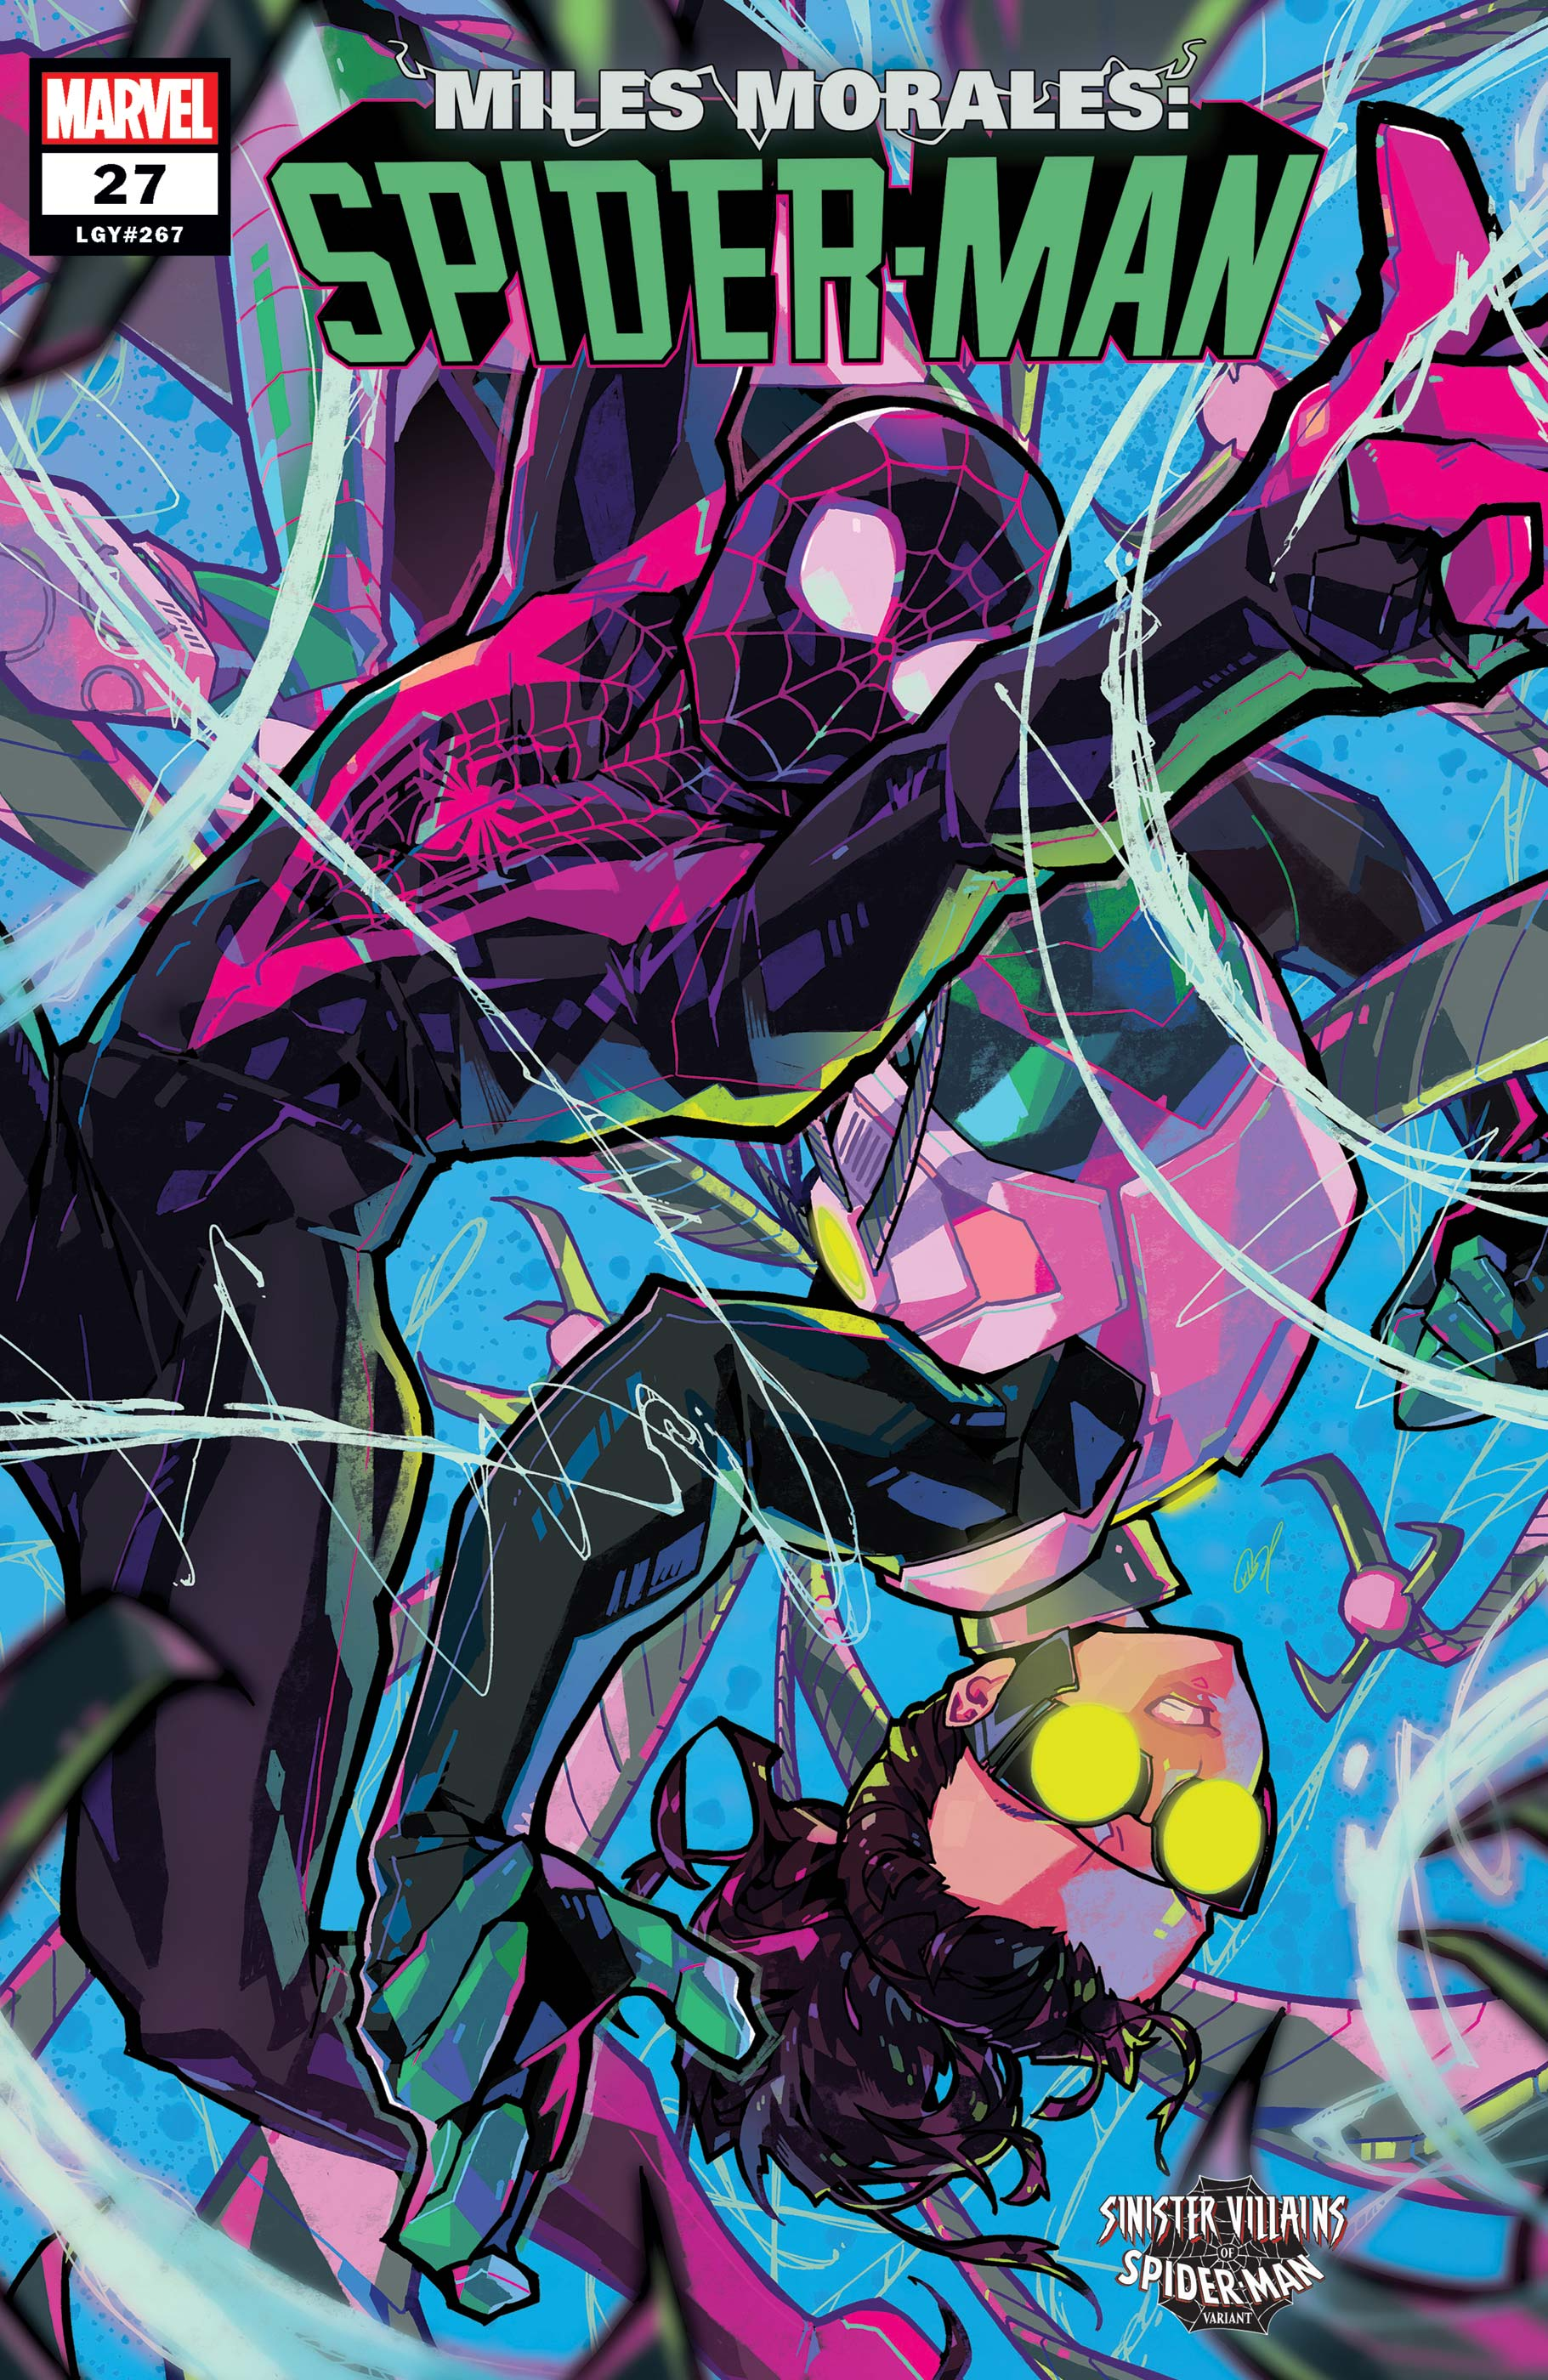 Miles Morales: Spider-Man (2018) #27 (Variant)